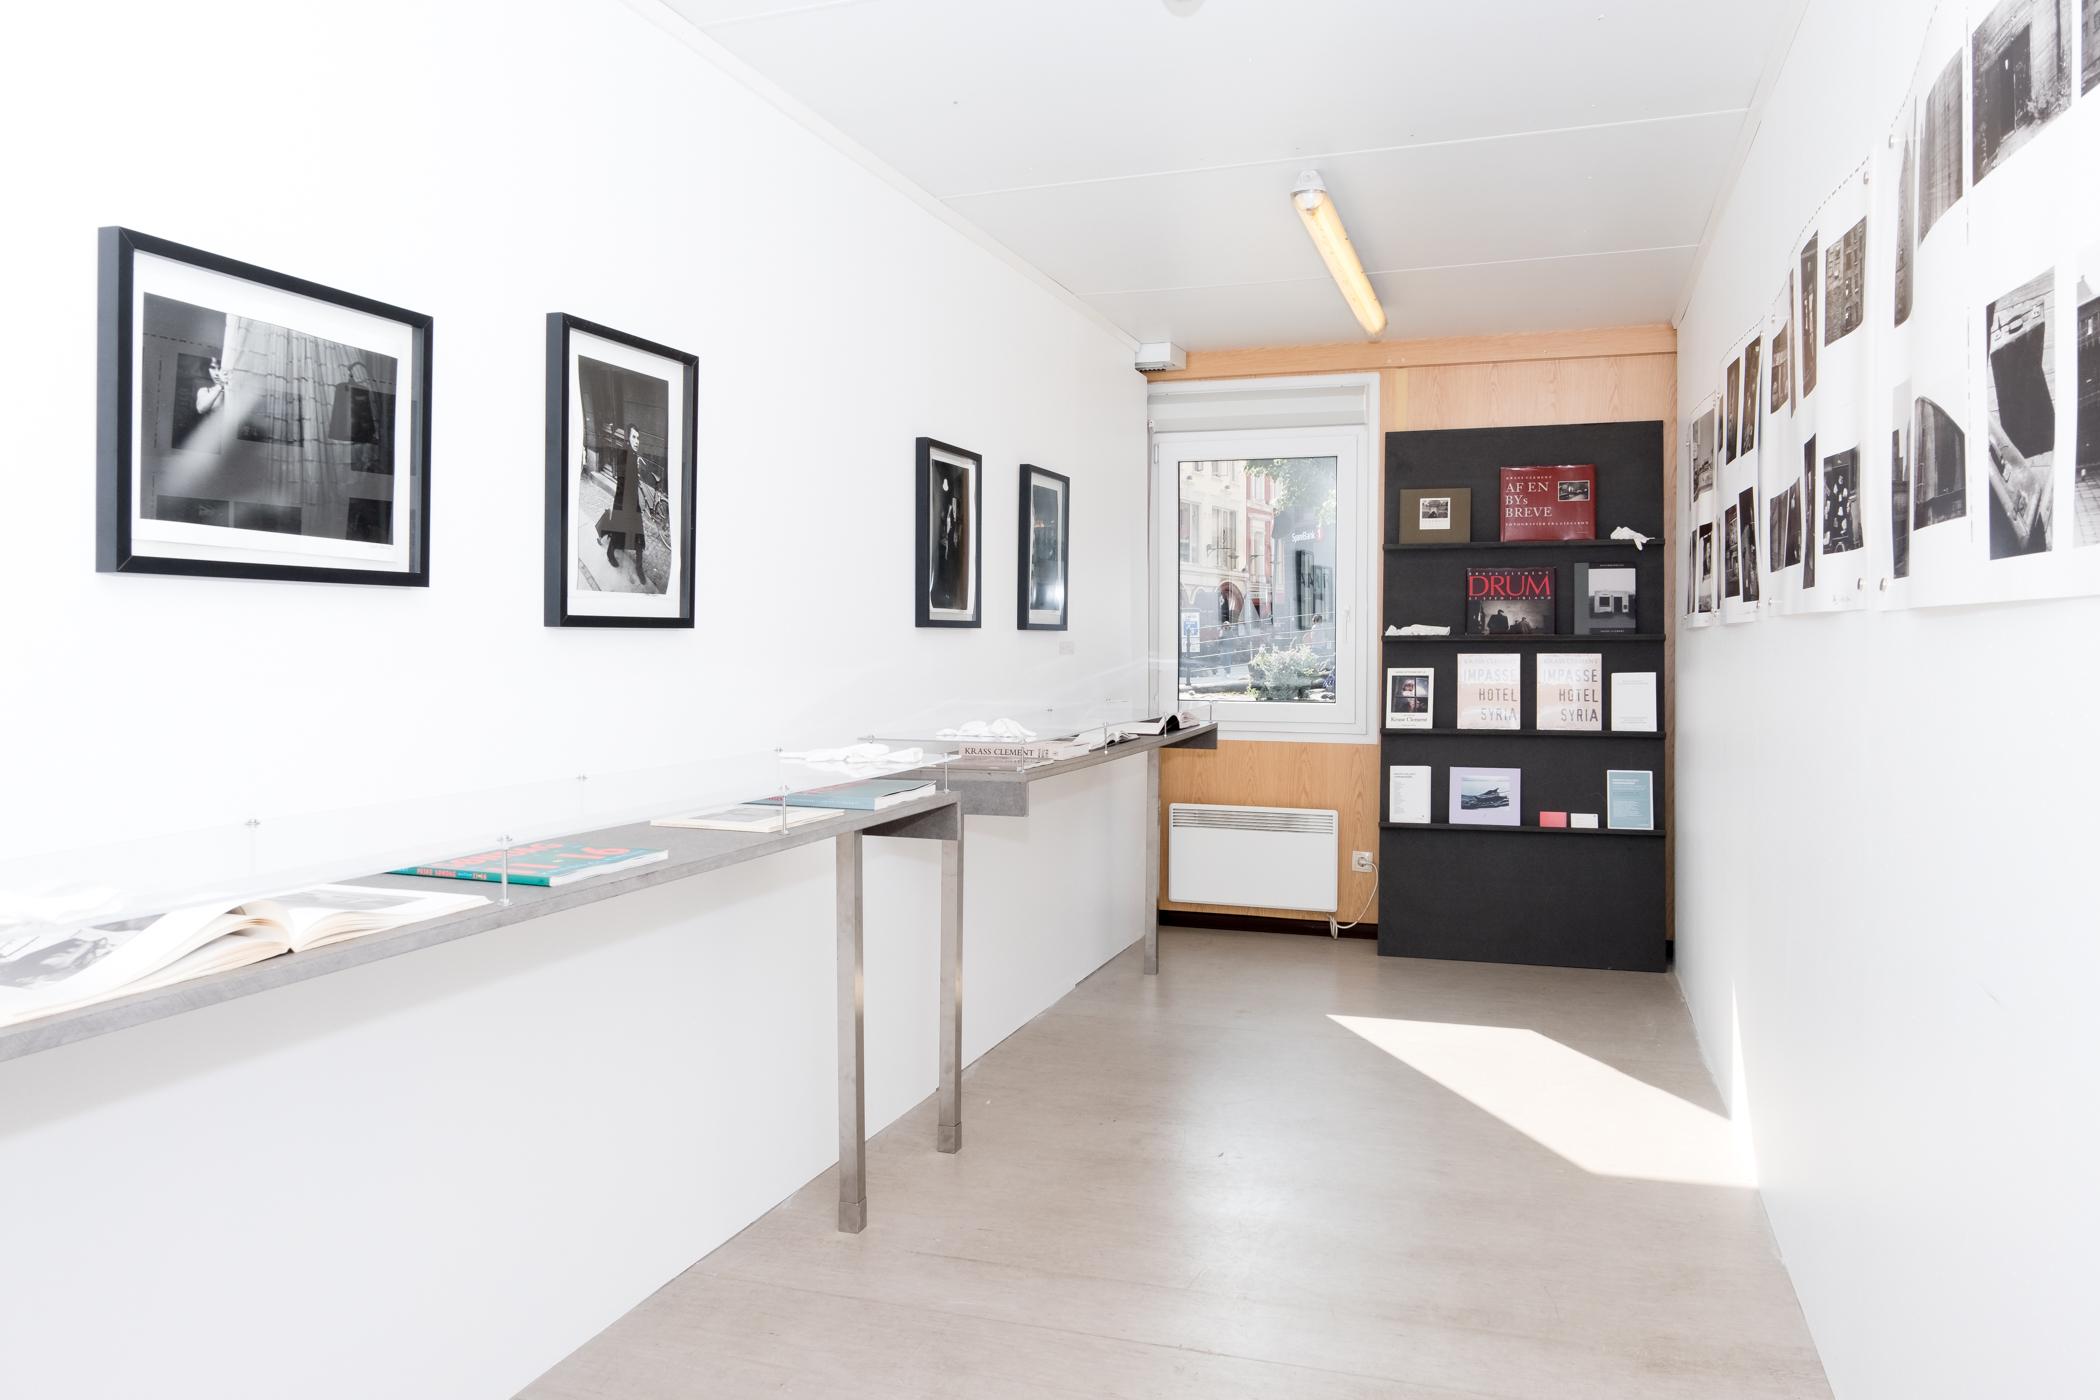 Fotobokfestival Oslo  2016